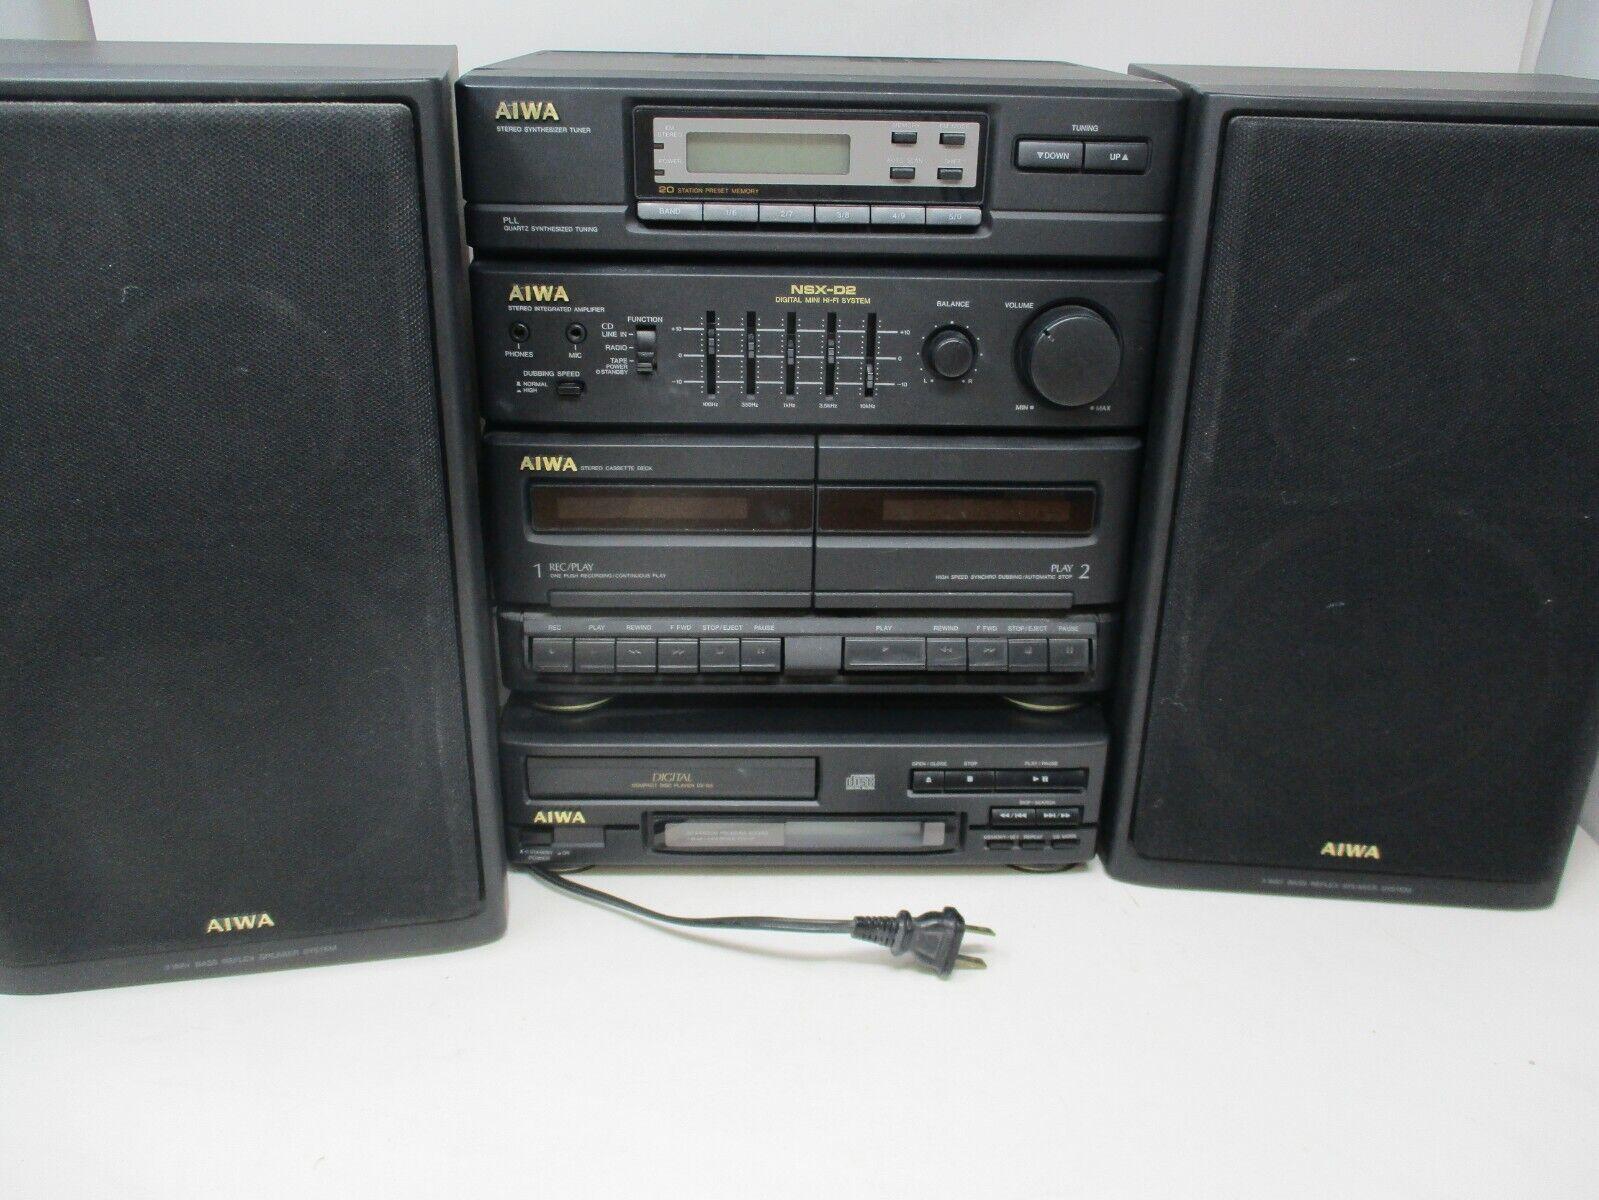 Aiwa Compact Stereo System Receiver Cassette CD XS-N2U DX-N3U